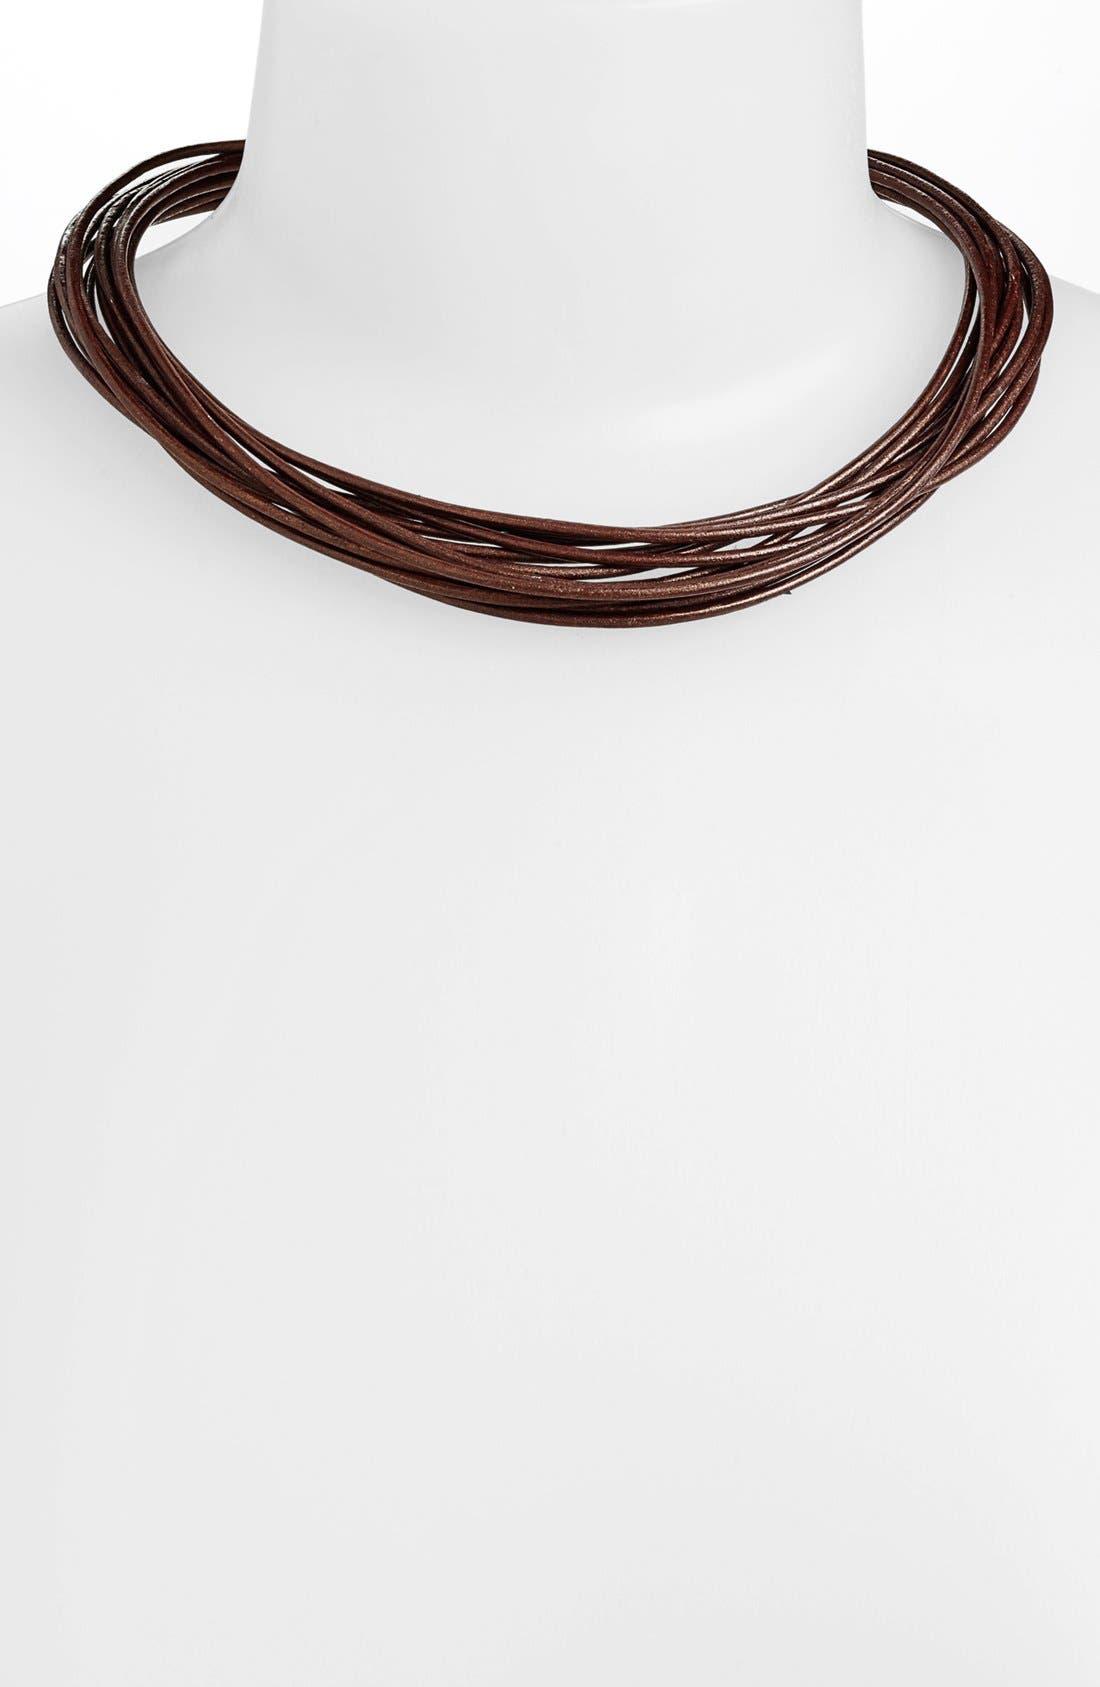 Alternate Image 1 Selected - Simon Sebbag Multistrand Leather Necklace